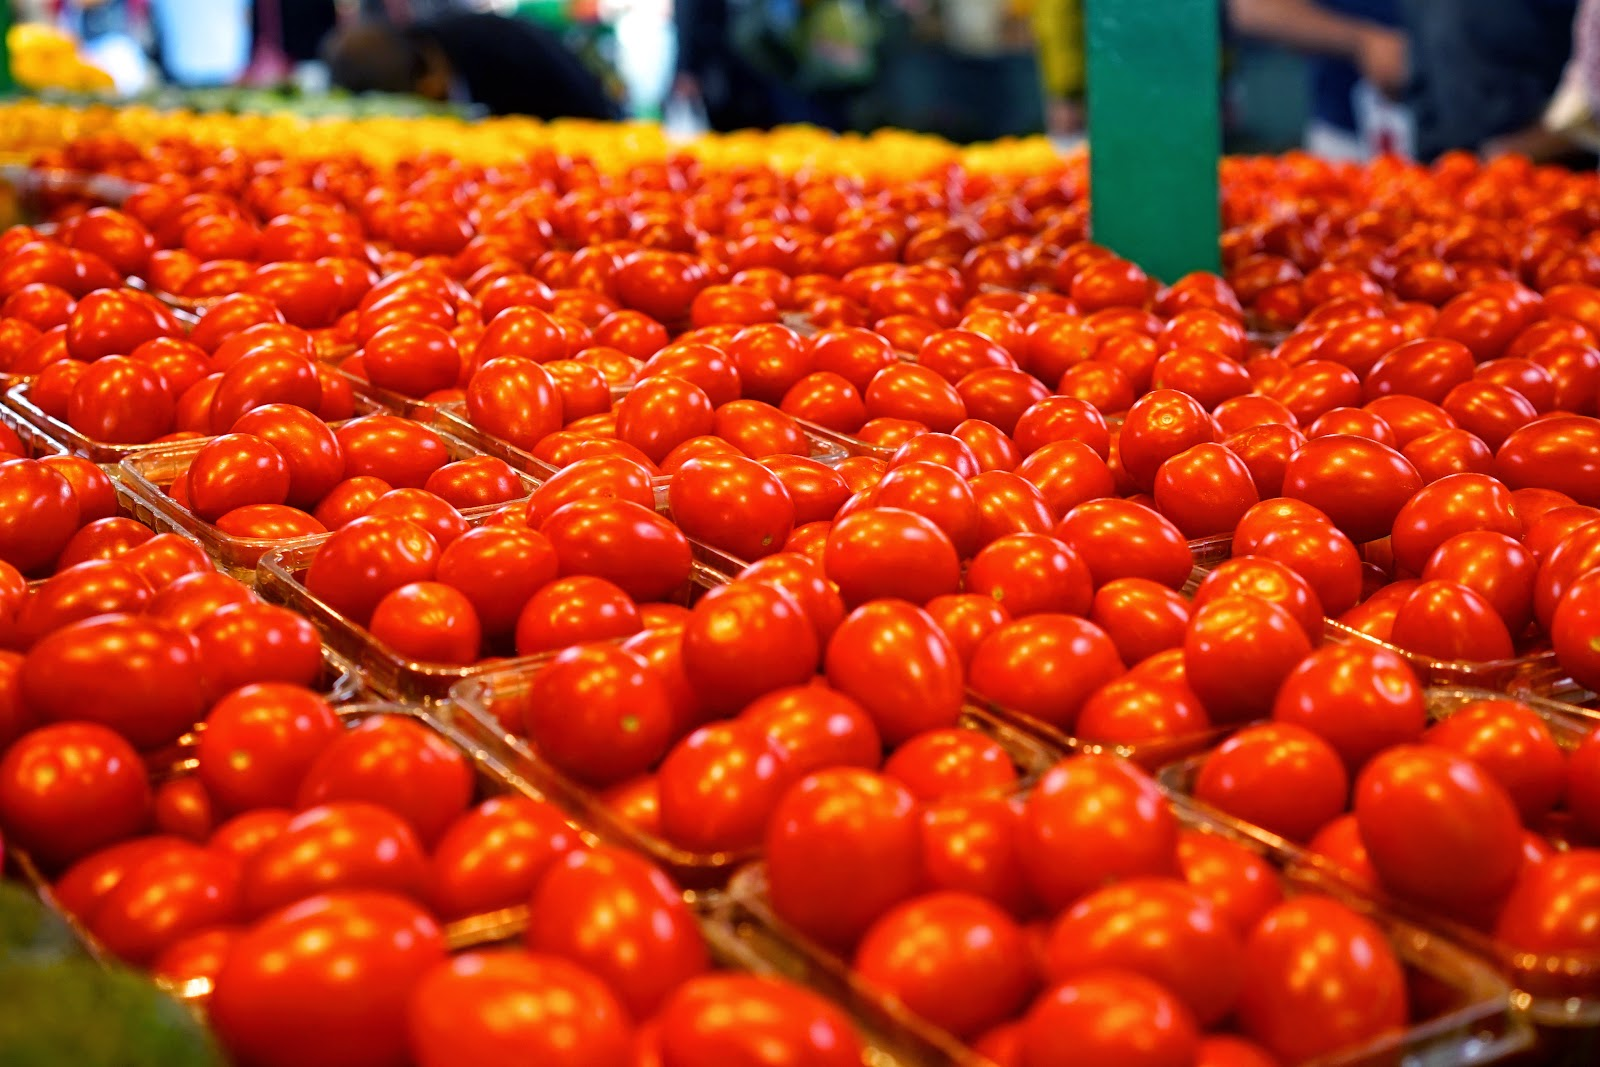 jean talon market tomatoes